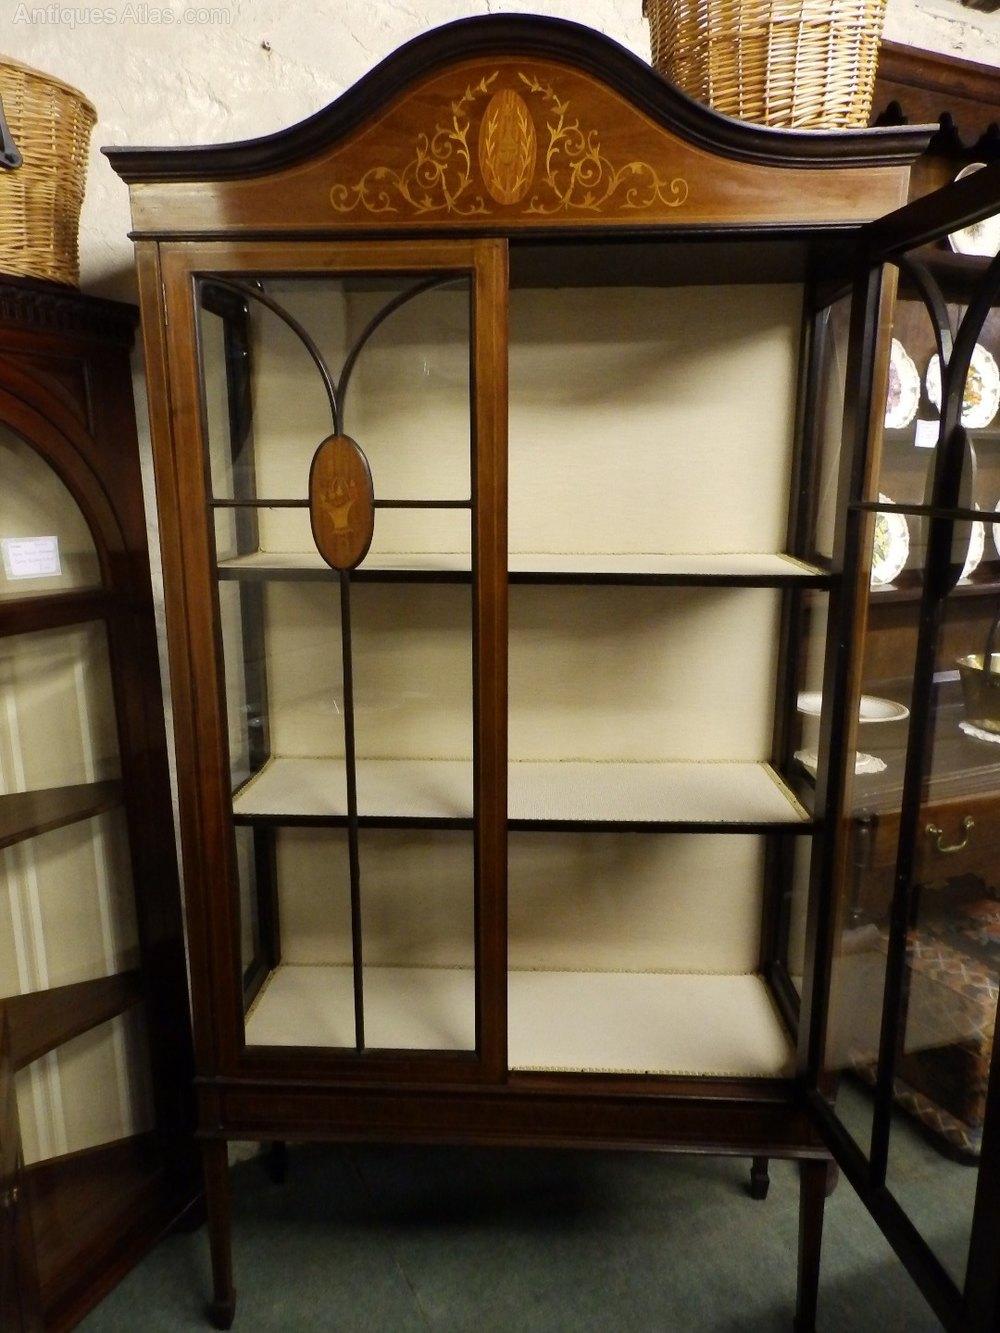 Edwardian Display Cabinet Antique Display Cabinets ... - Edwardian Display Cabinet - Antiques Atlas